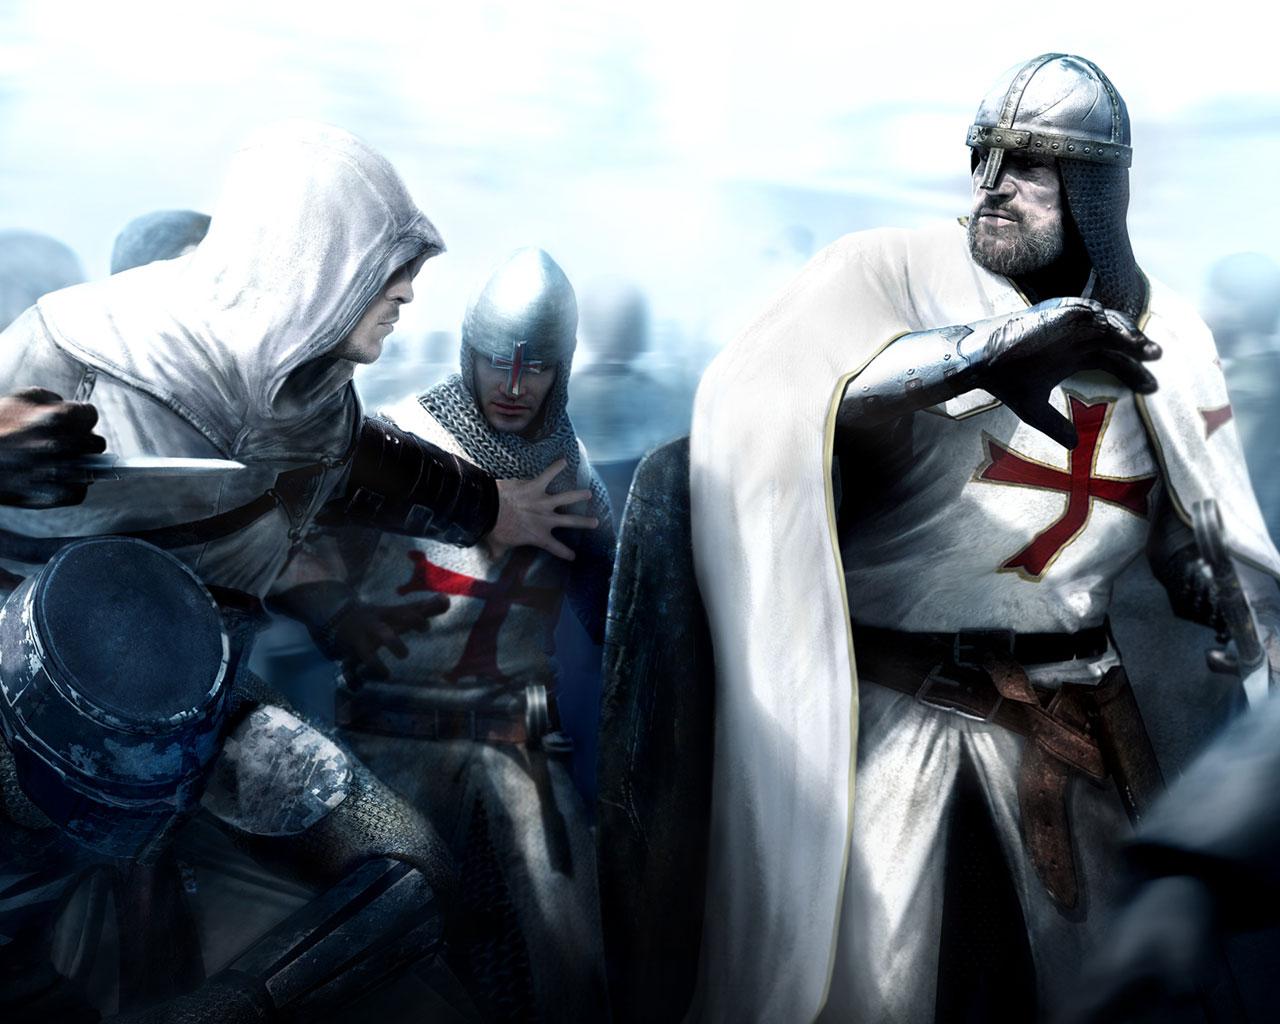 Ac1 Concept Art Wallpaper 6 Image Assassin S Creed Mod Db